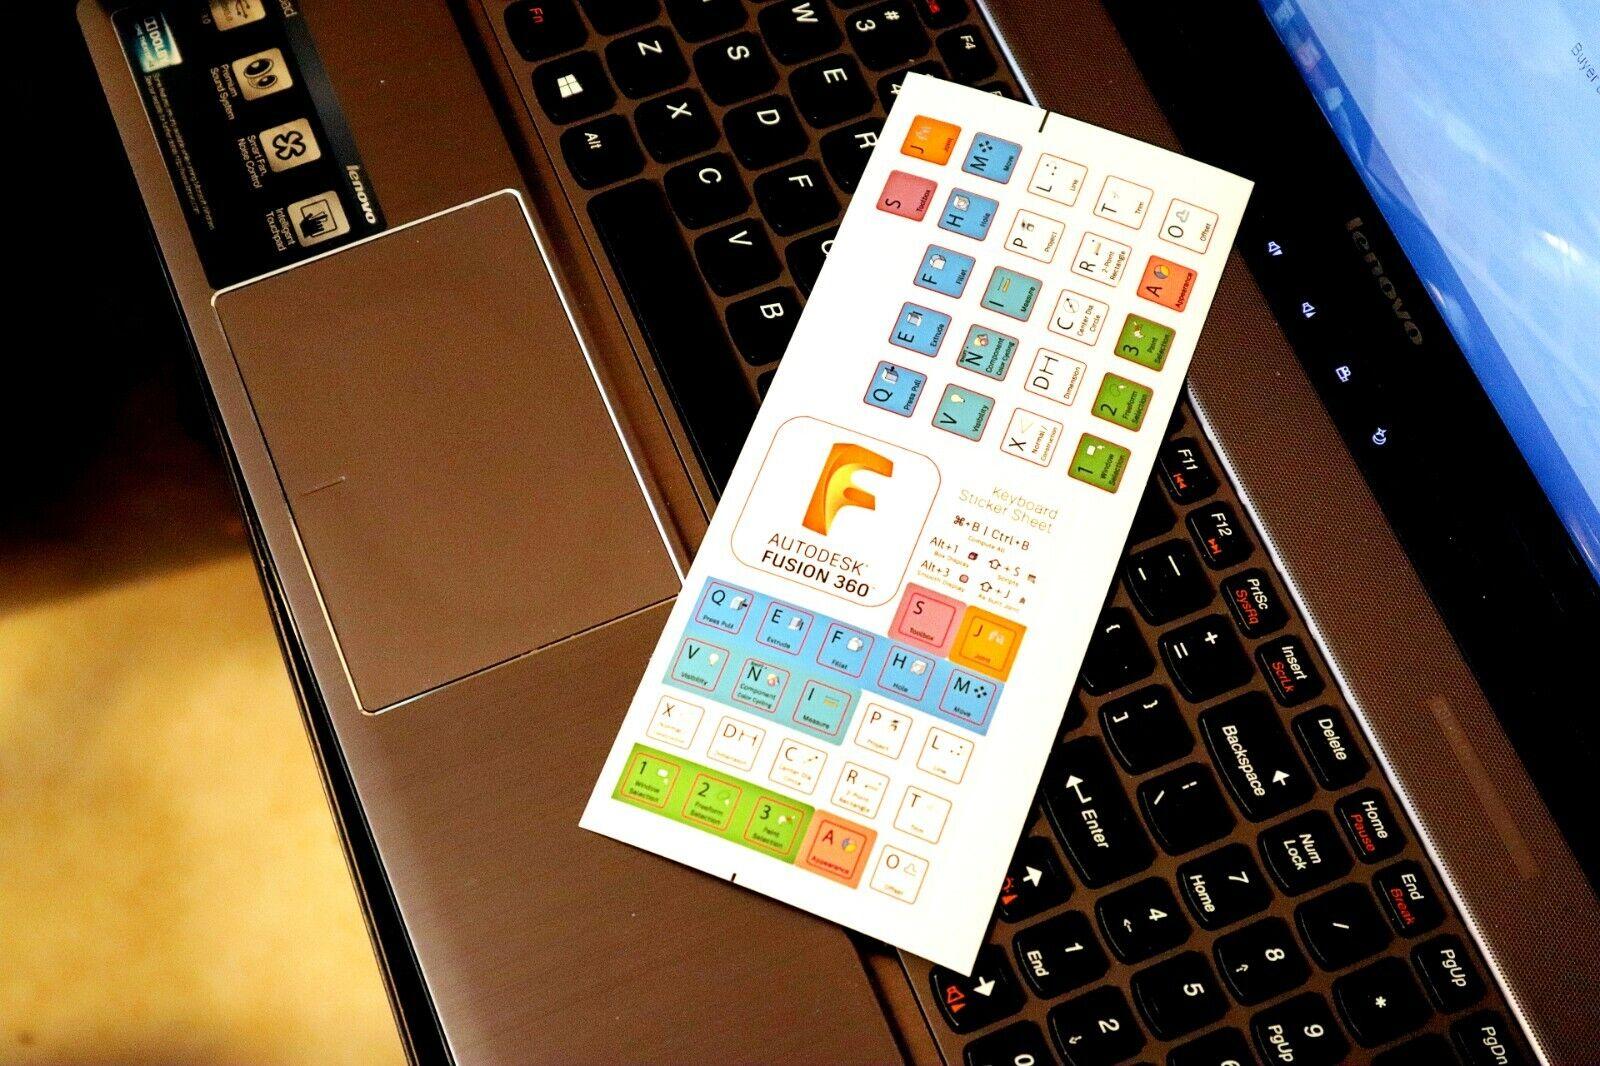 Fusion 360 Keyboard Shortcuts ( Mach3, CAD/CAM, Mach4, CNC, 3D Printer)